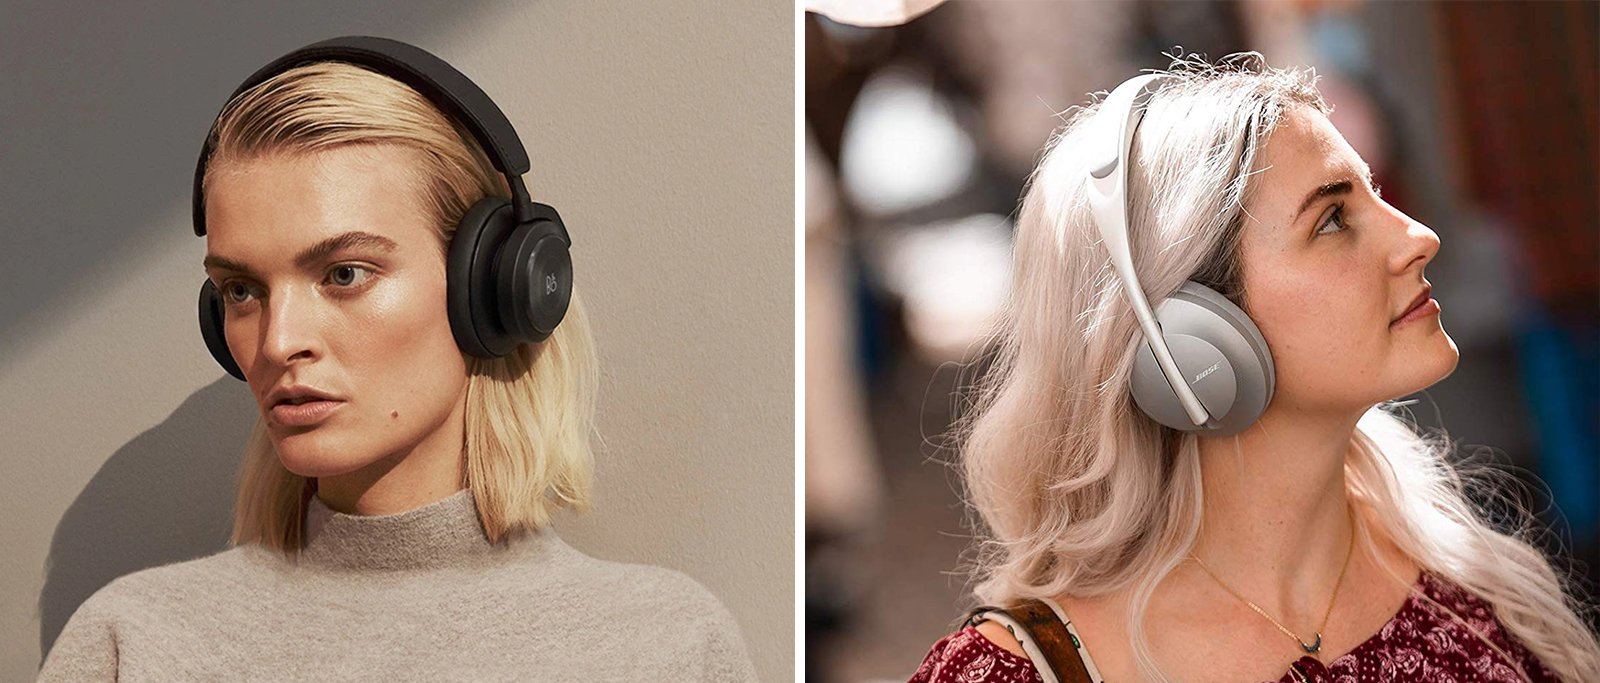 Bang & Olufsen vs Bose Noise Cancelling Headphones Comparison